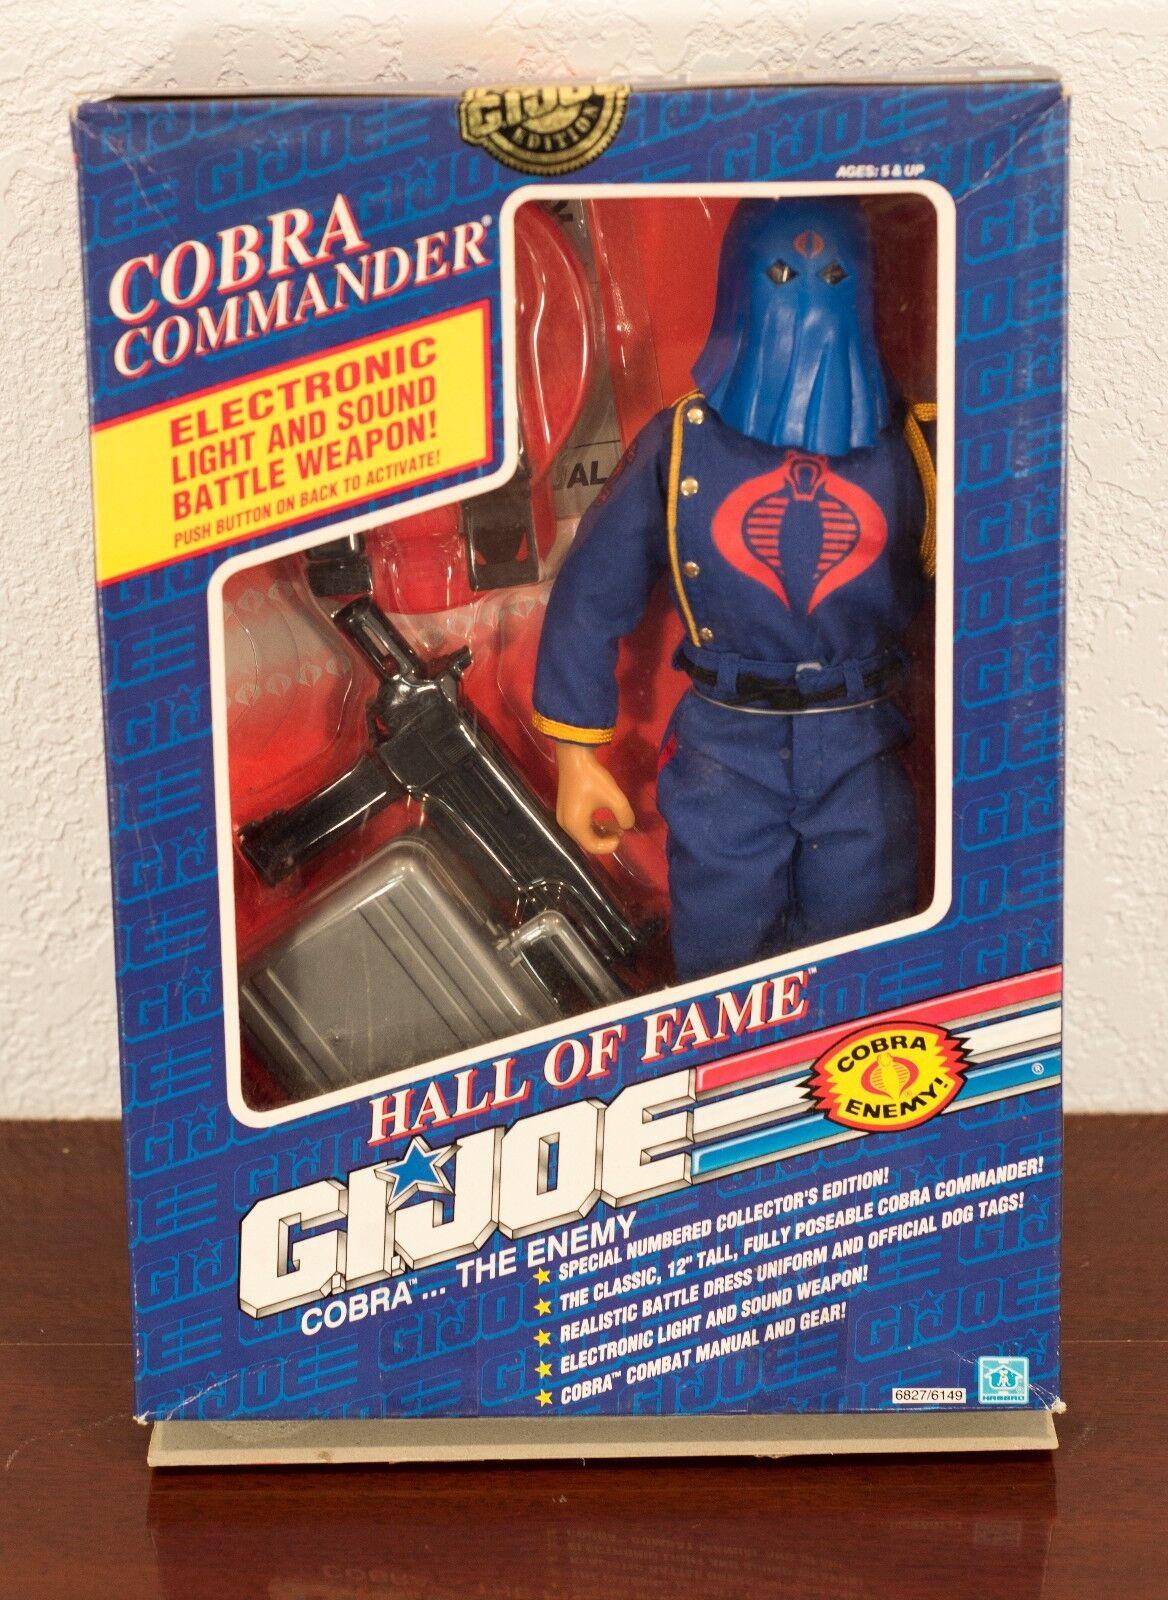 1991 - gi joe hall of fame cobra - kommandant actionfigur mib